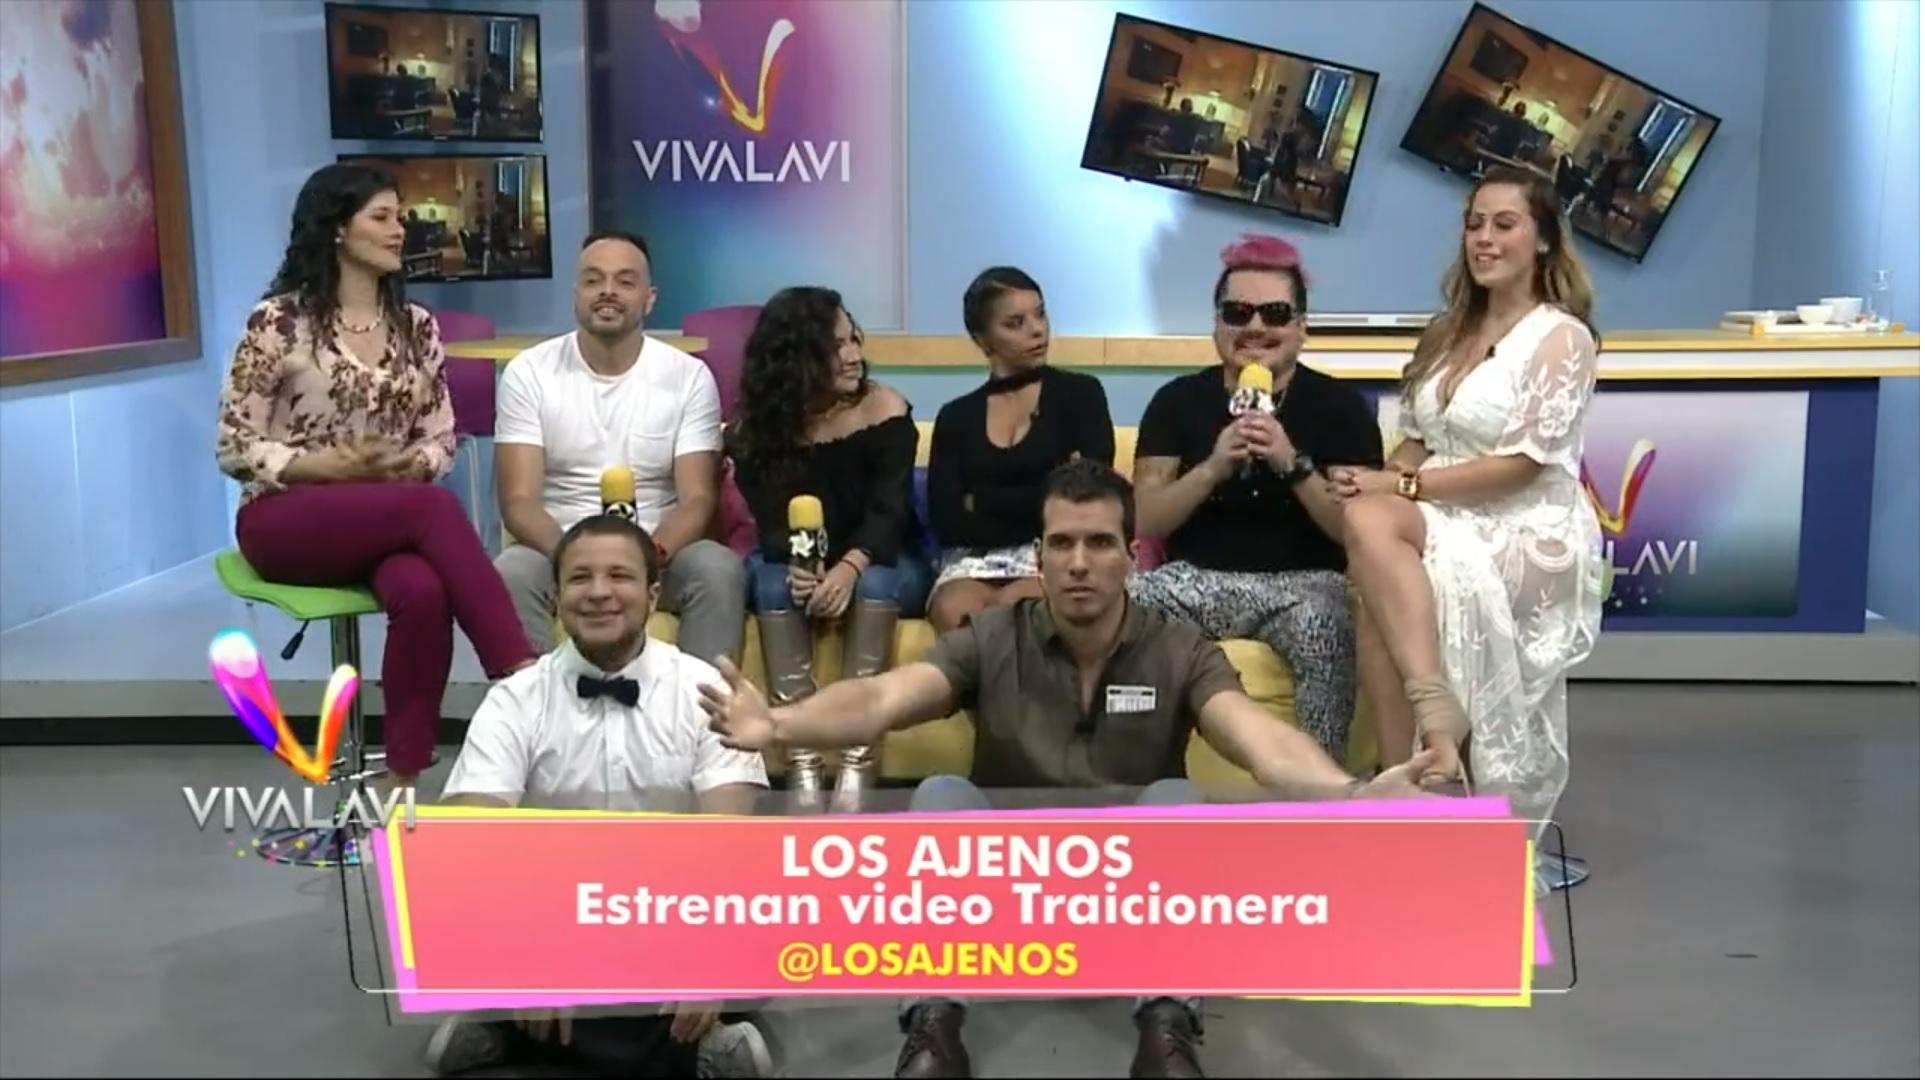 (+VIDEO) Los Ajenos trajeron'Traicionera' a Vivalavi